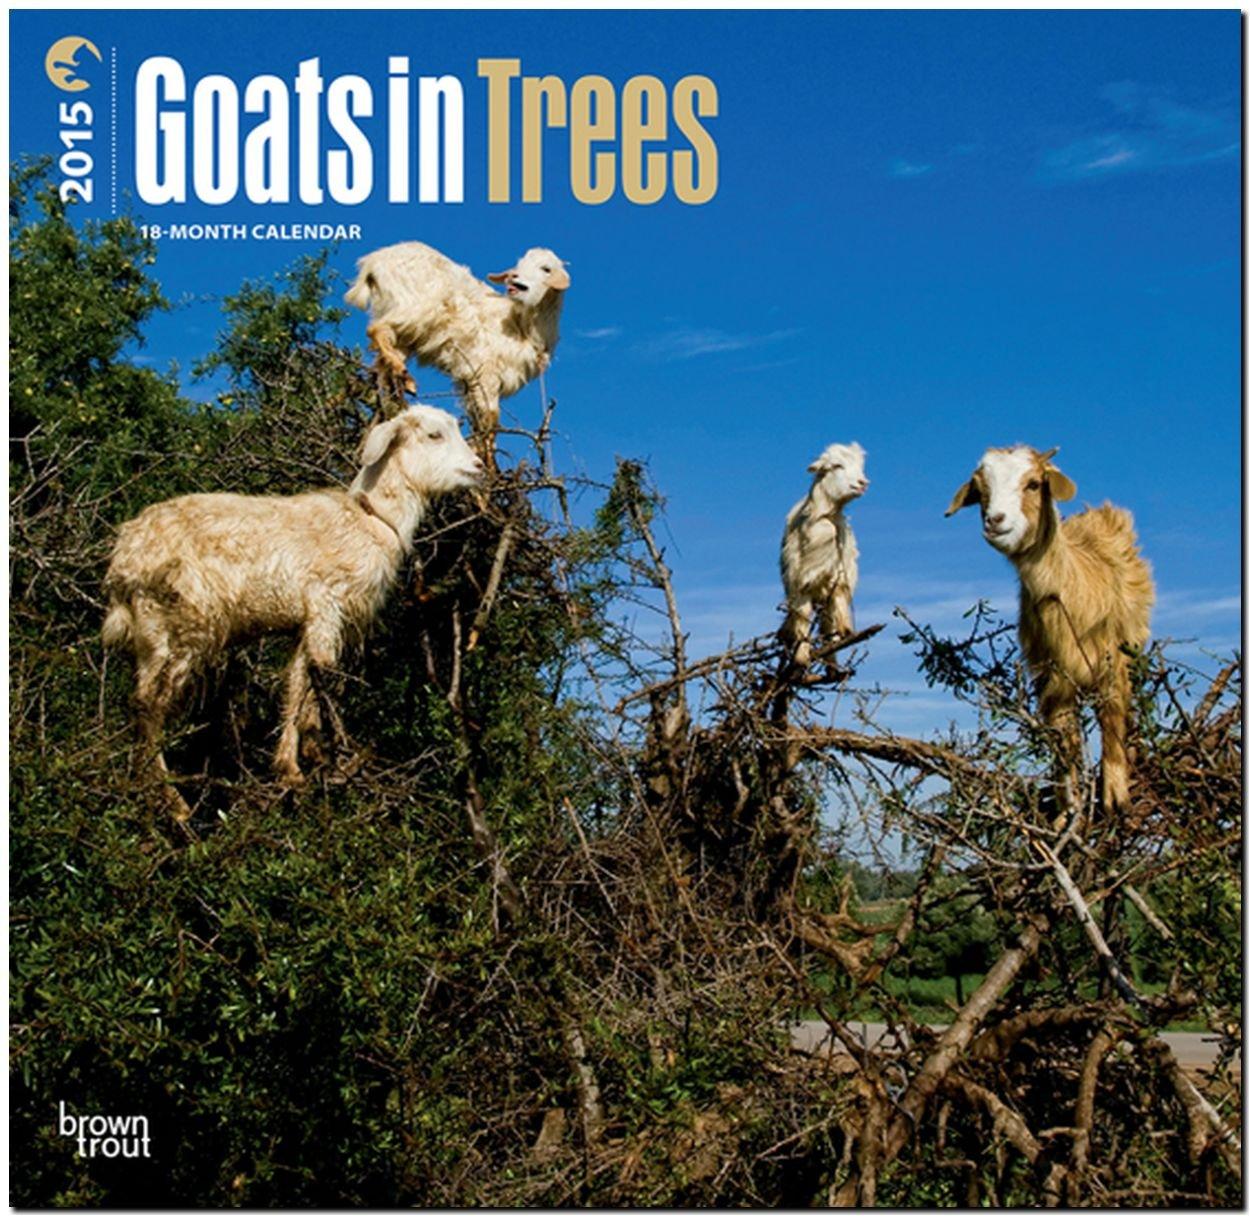 Goats in Trees 2015 - Ziegen auf Bäumen: Original BrownTrout-Kalender [Mehrsprachig] [Kalender]